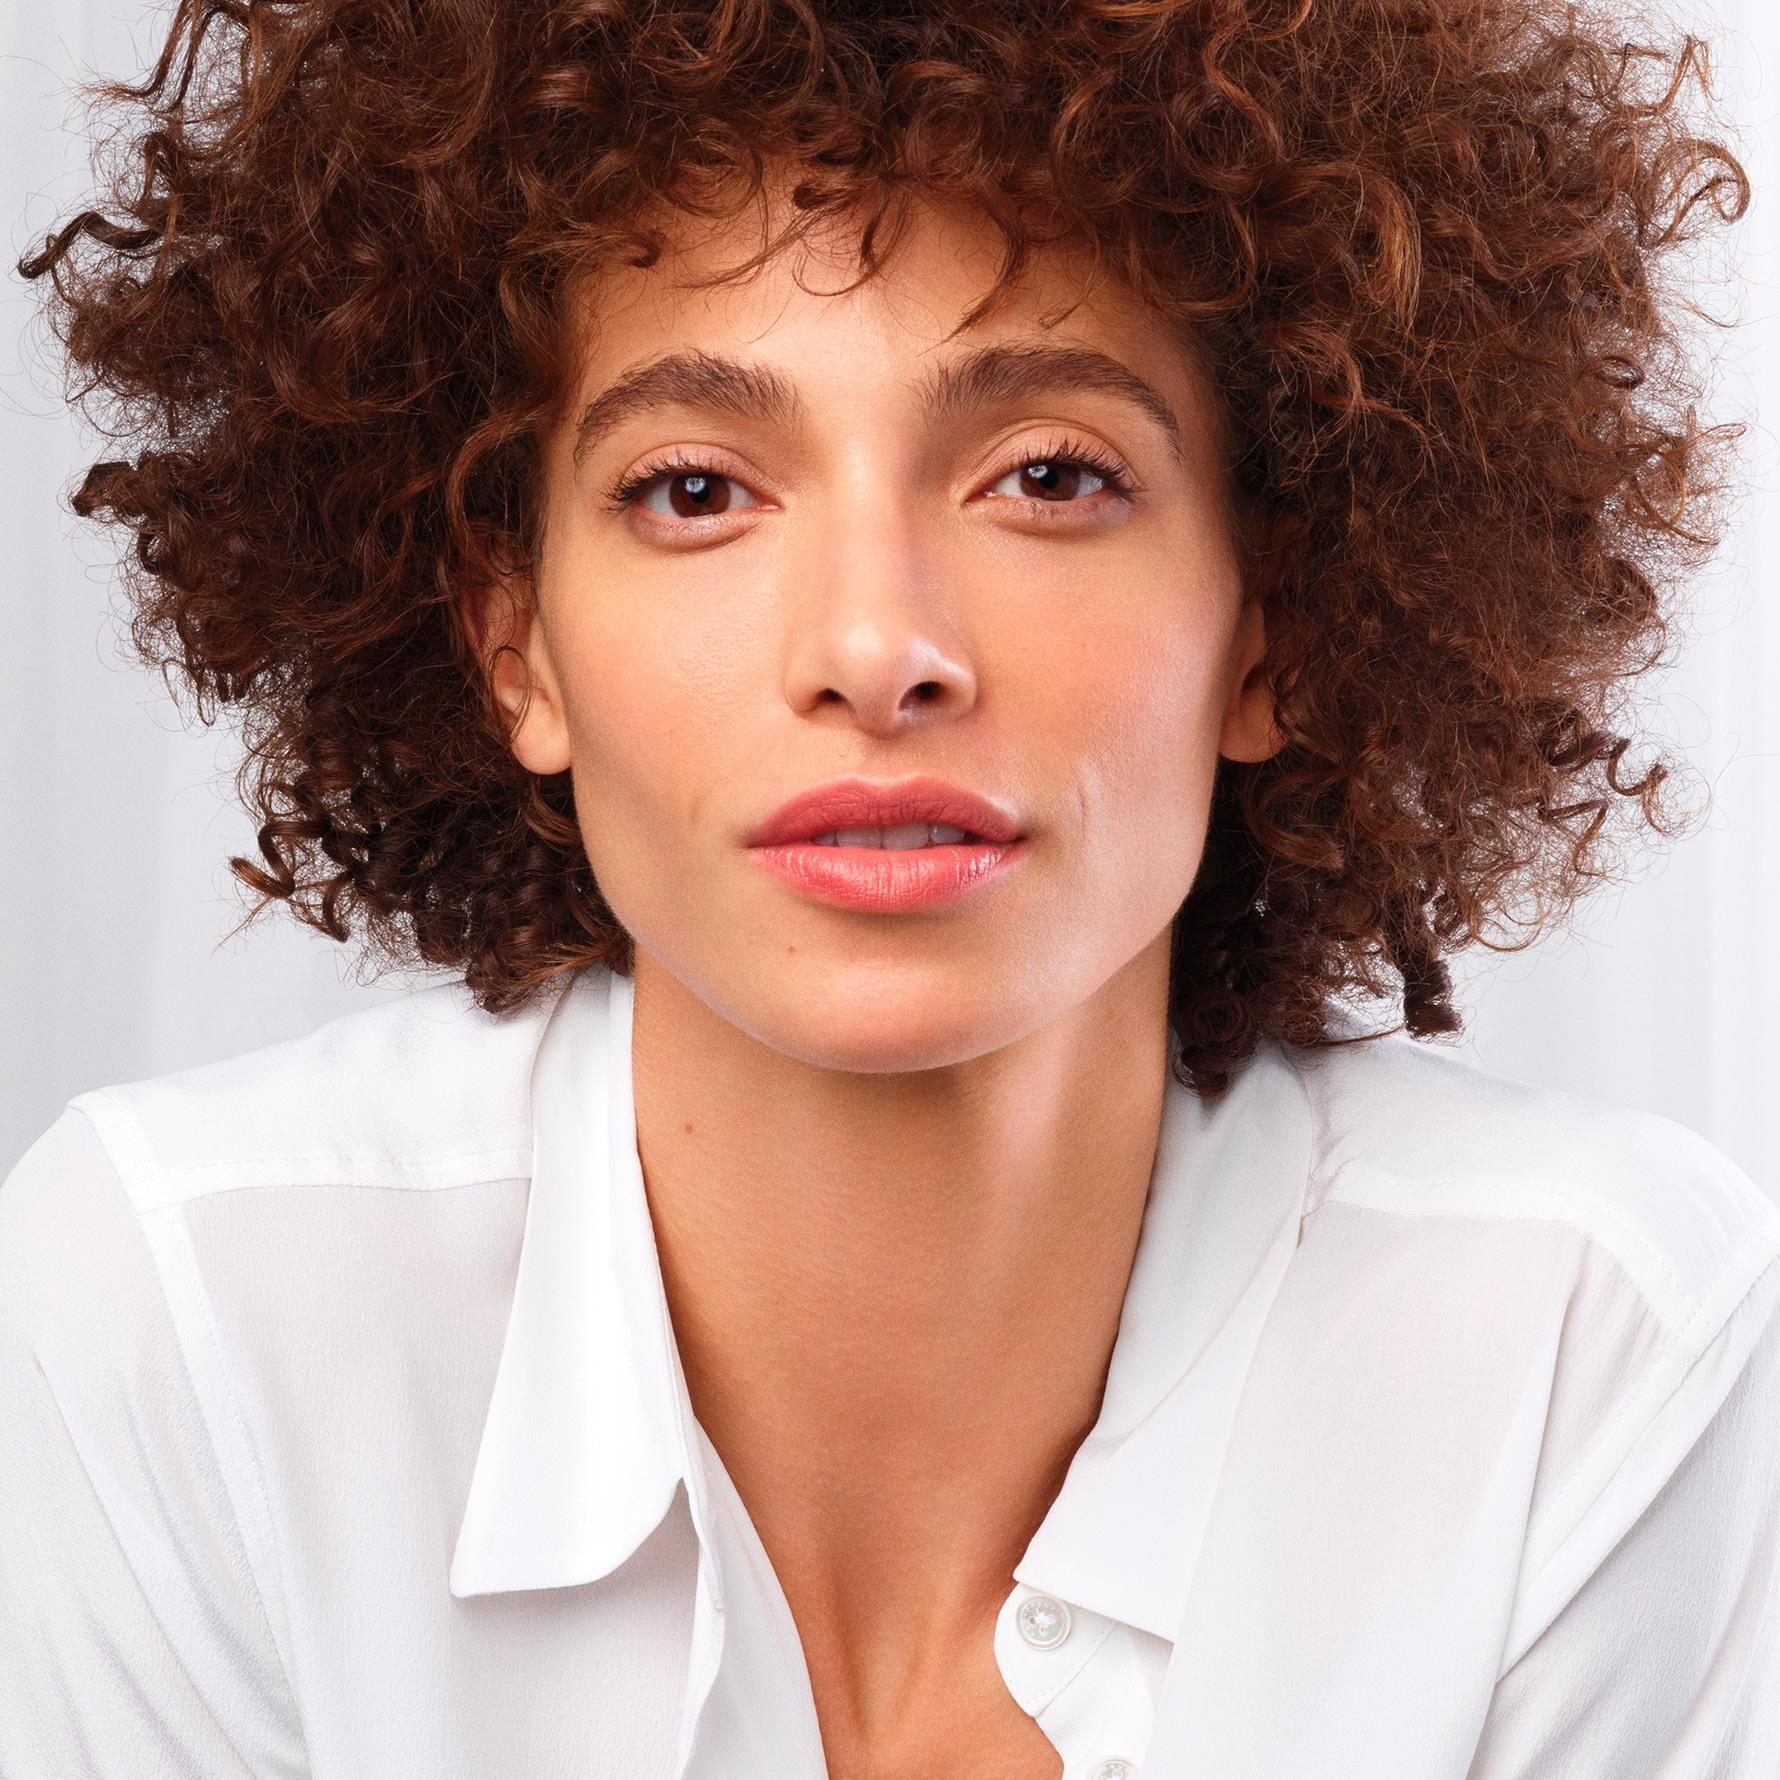 Køb Origins Blooming Bold Lipstick 23, 3,1 g - Matas